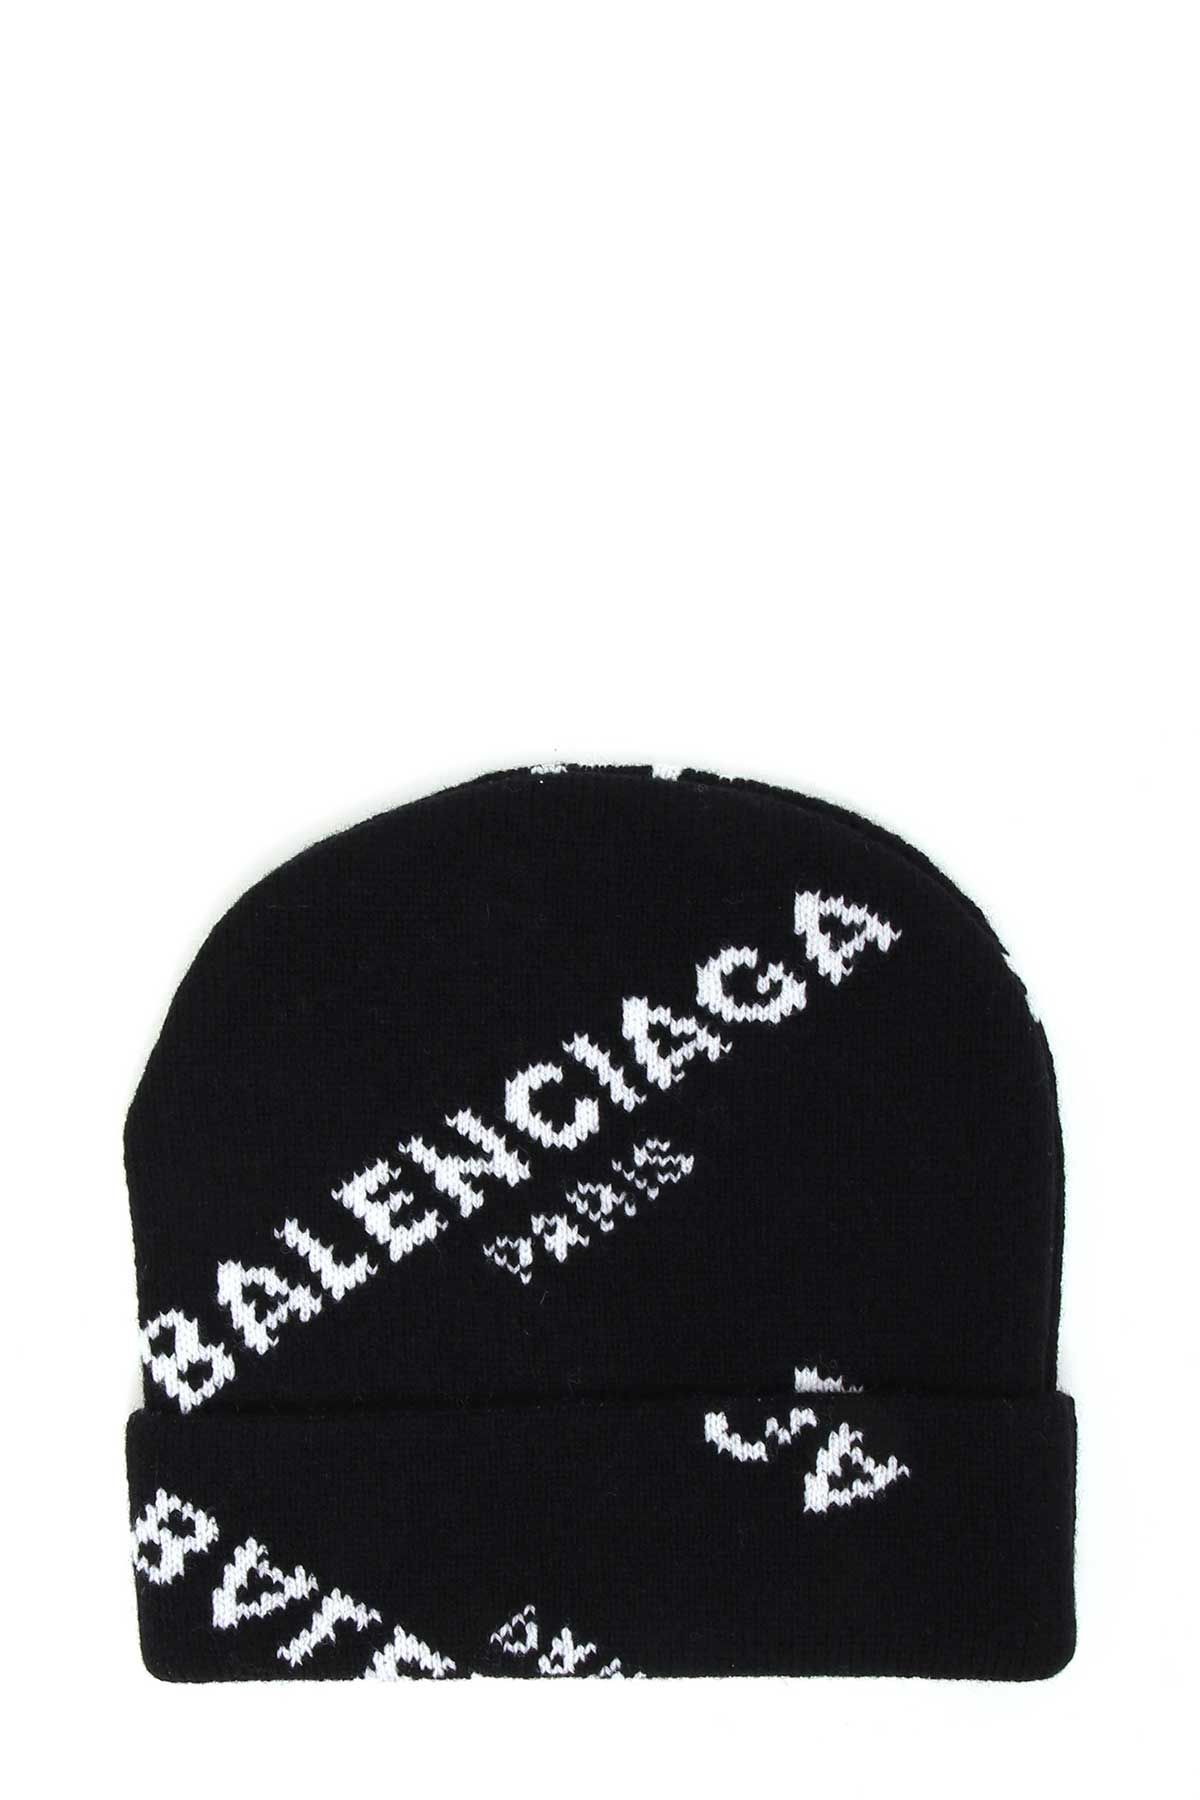 Balenciaga Wool Knitted Cap With Logo